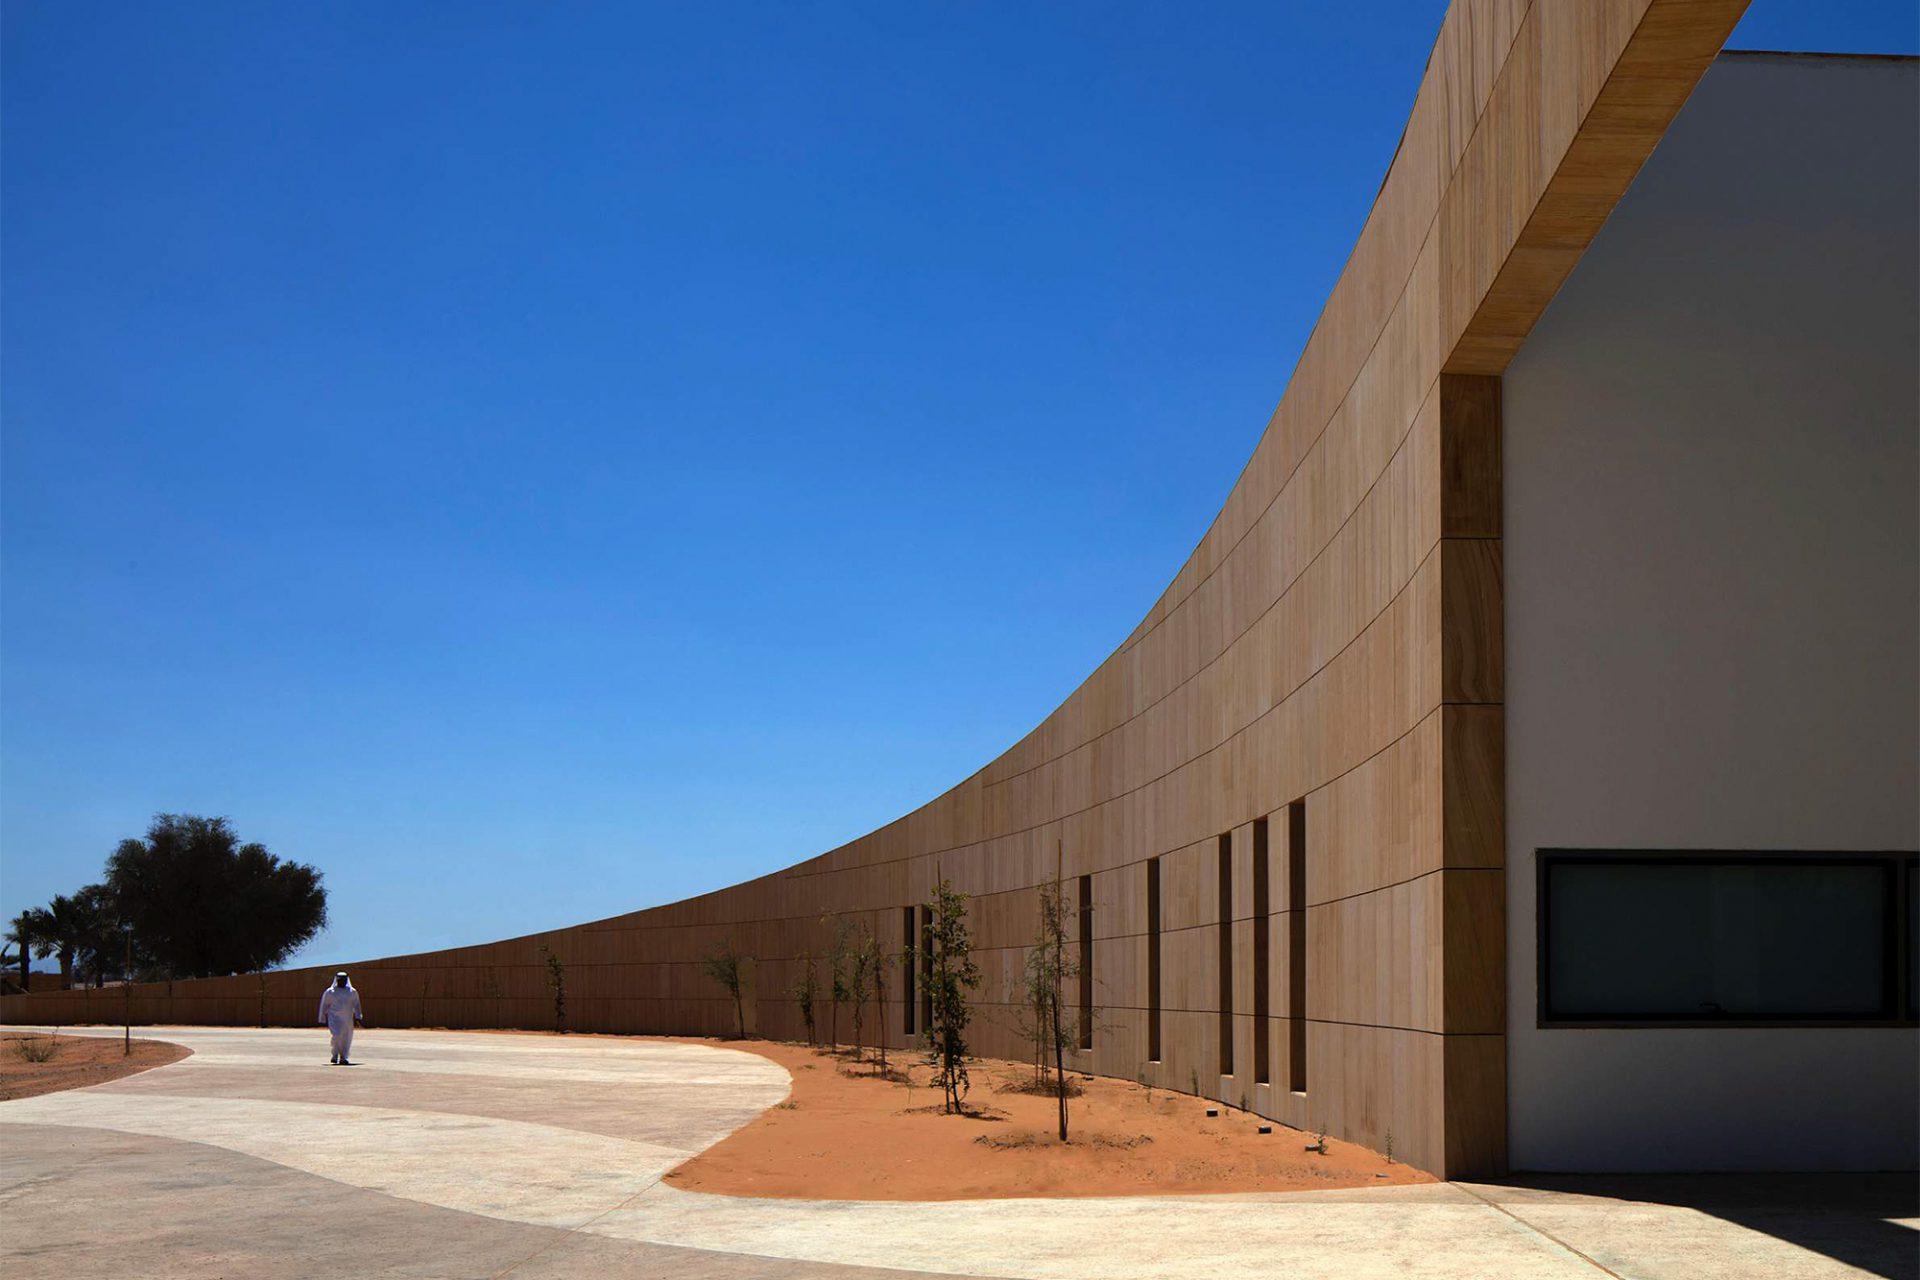 Mleiha Archaeological Centre. Ein sanfter Schwung